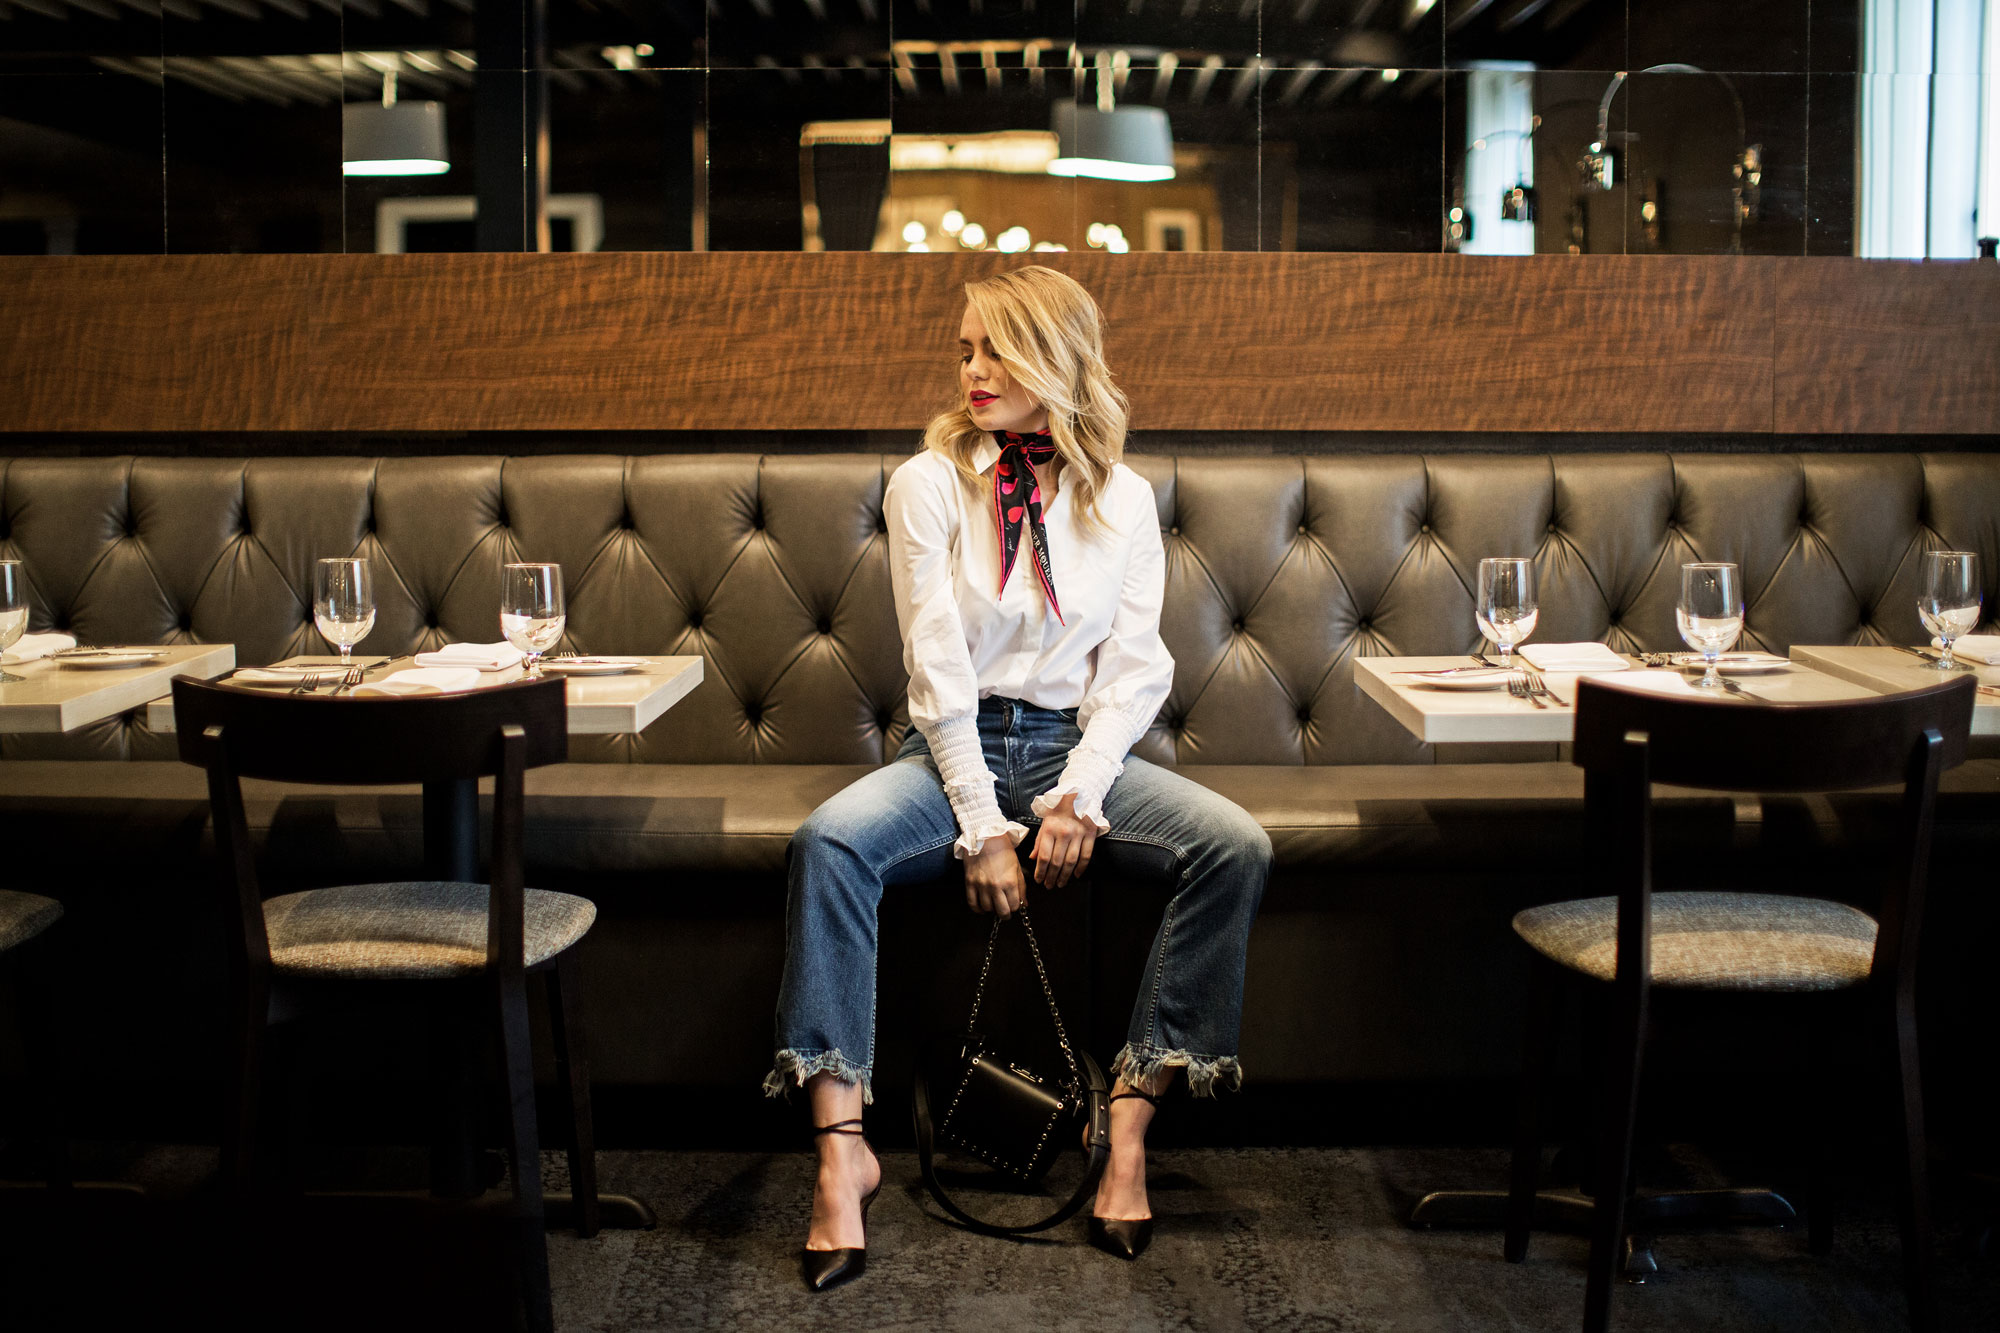 Alexander McQueen scarf and handbag; Altuzzara blouse; Mother Denim jeans; Aquazurra heels